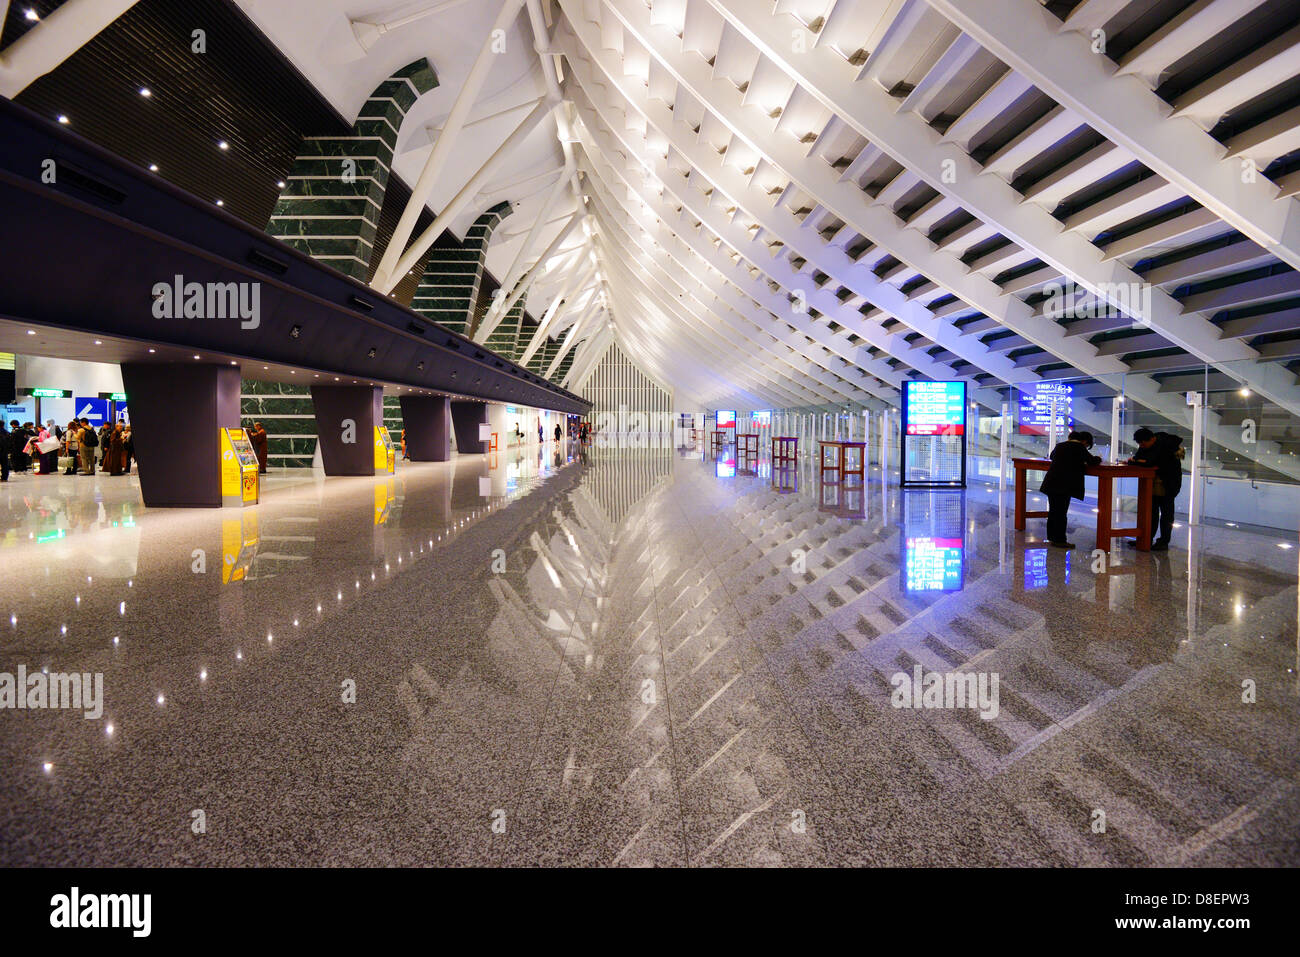 L'Aéroport International de Taiwan Taoyuan hall des douanes. Photo Stock